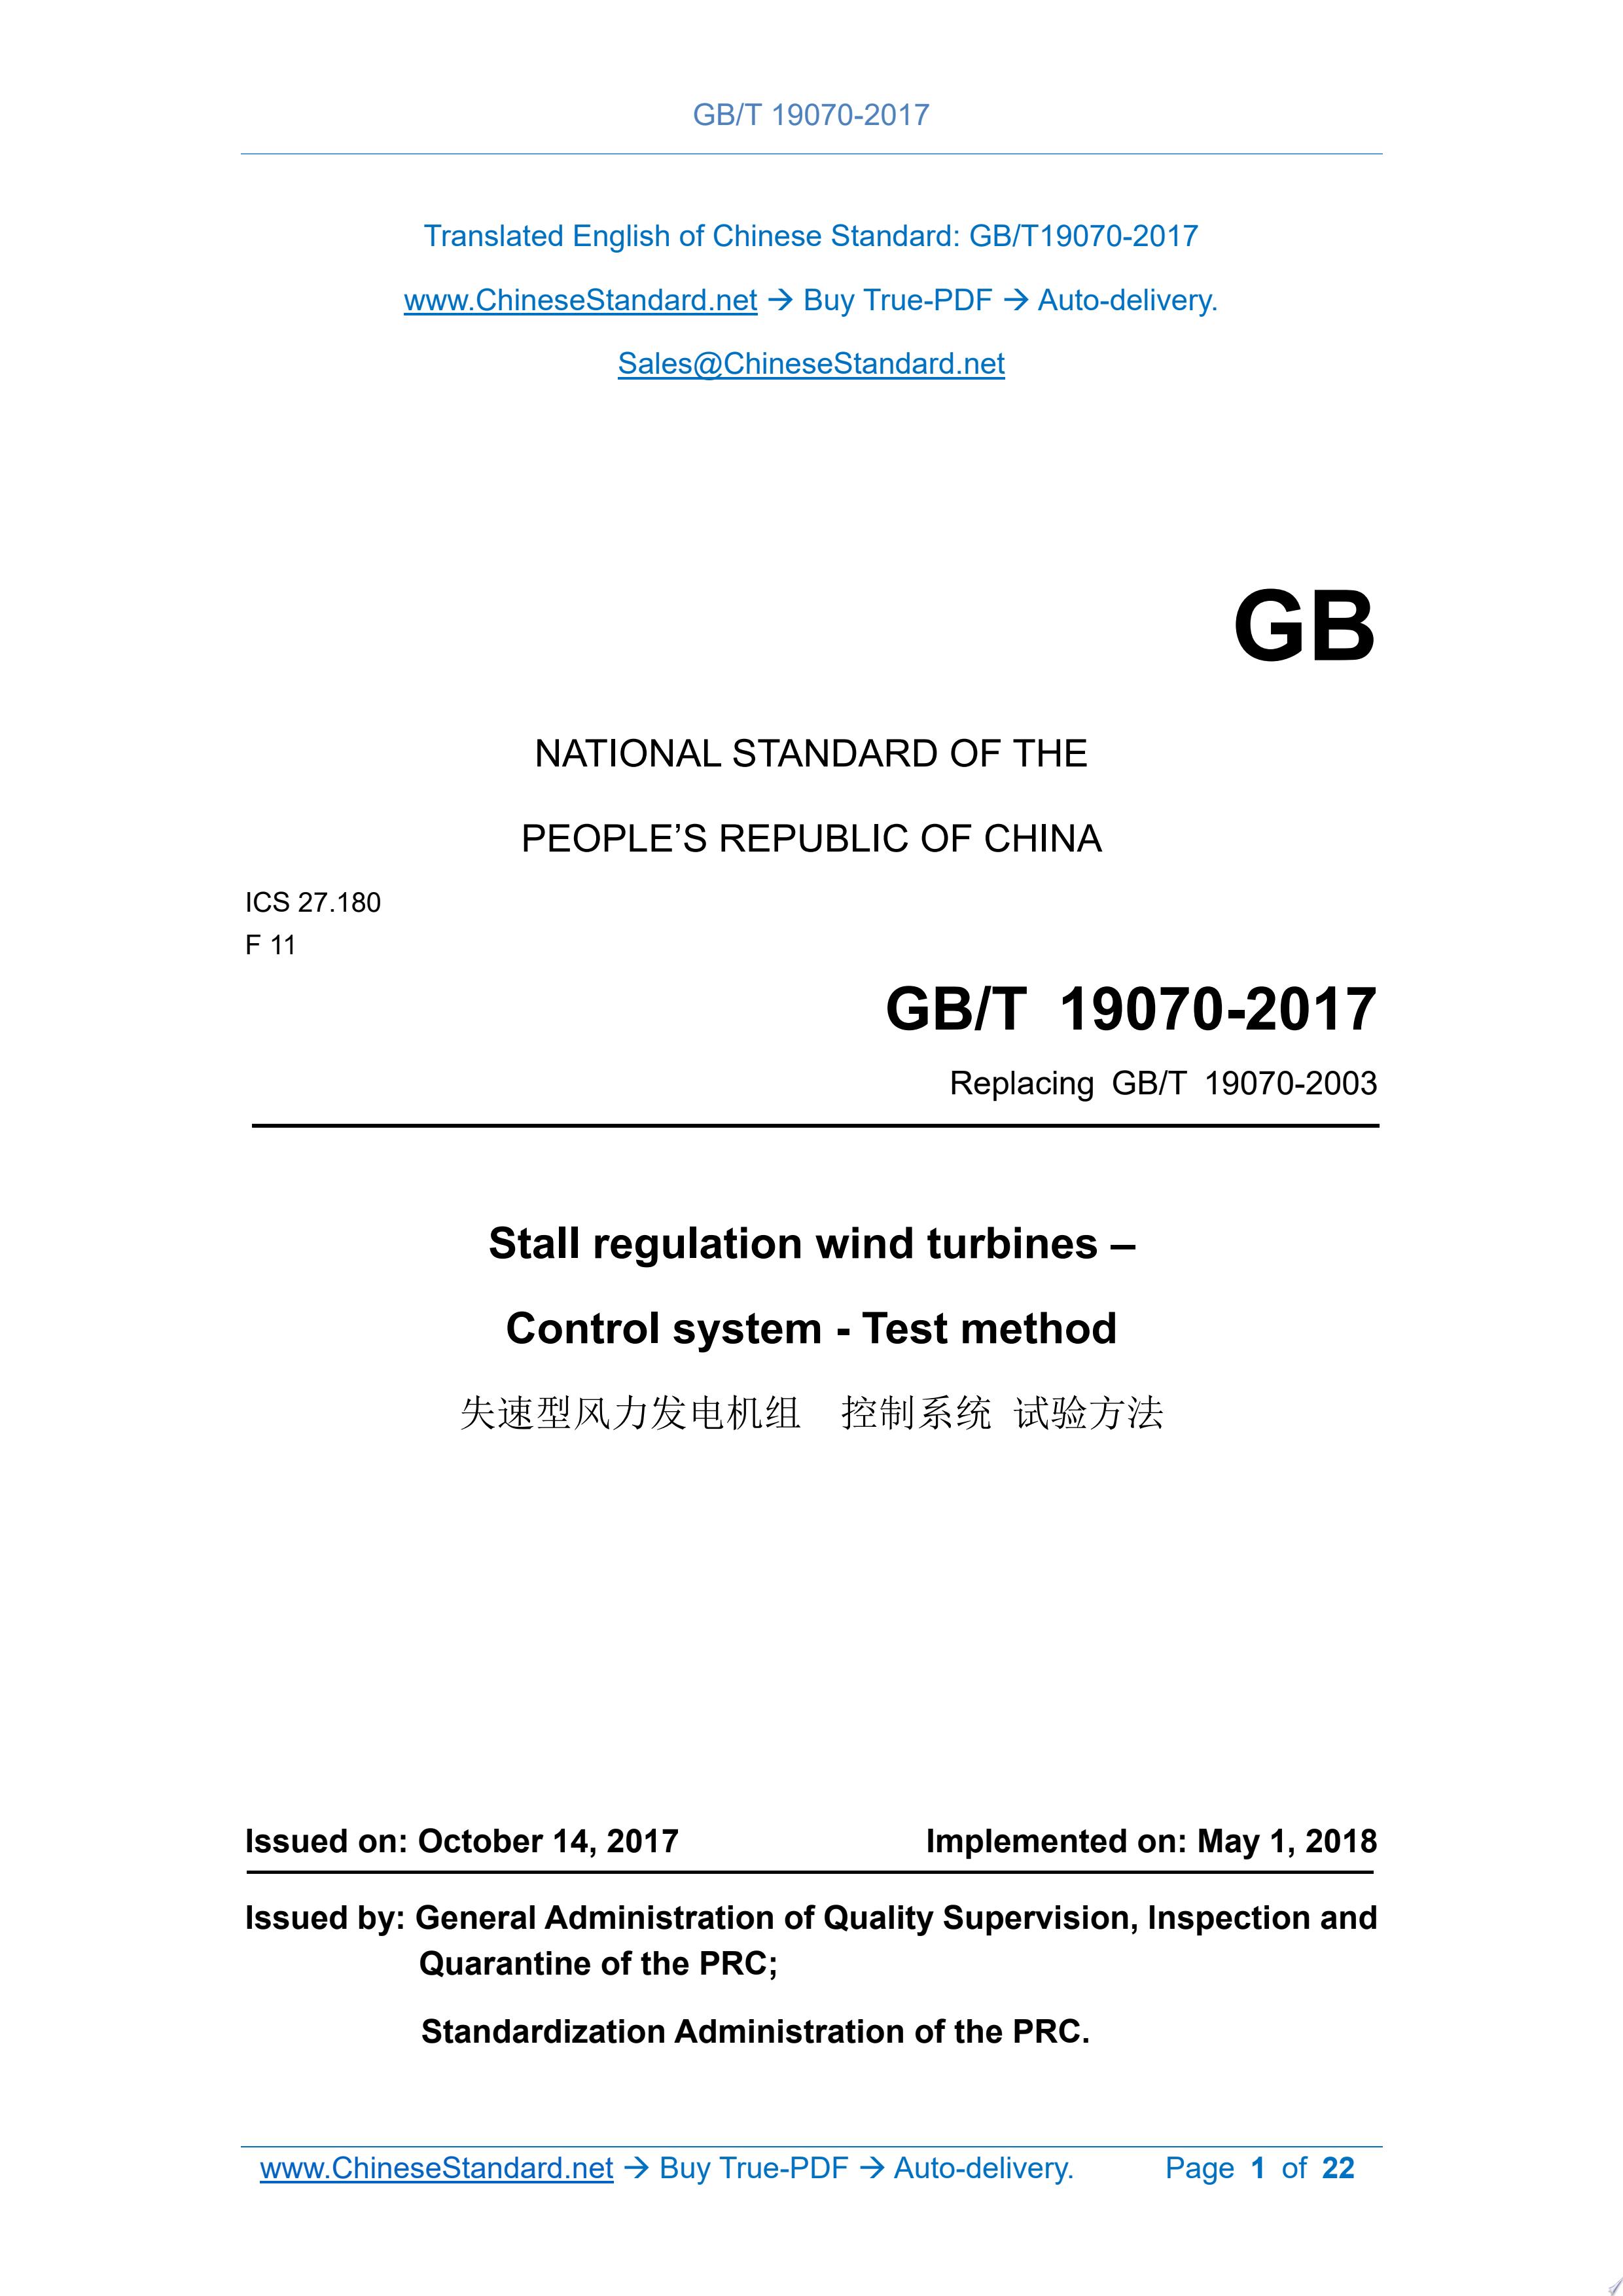 GB T 19070 2017  Translated English of Chinese Standard   GBT 19070 2017  GB T19070 2017  GBT19070 2017